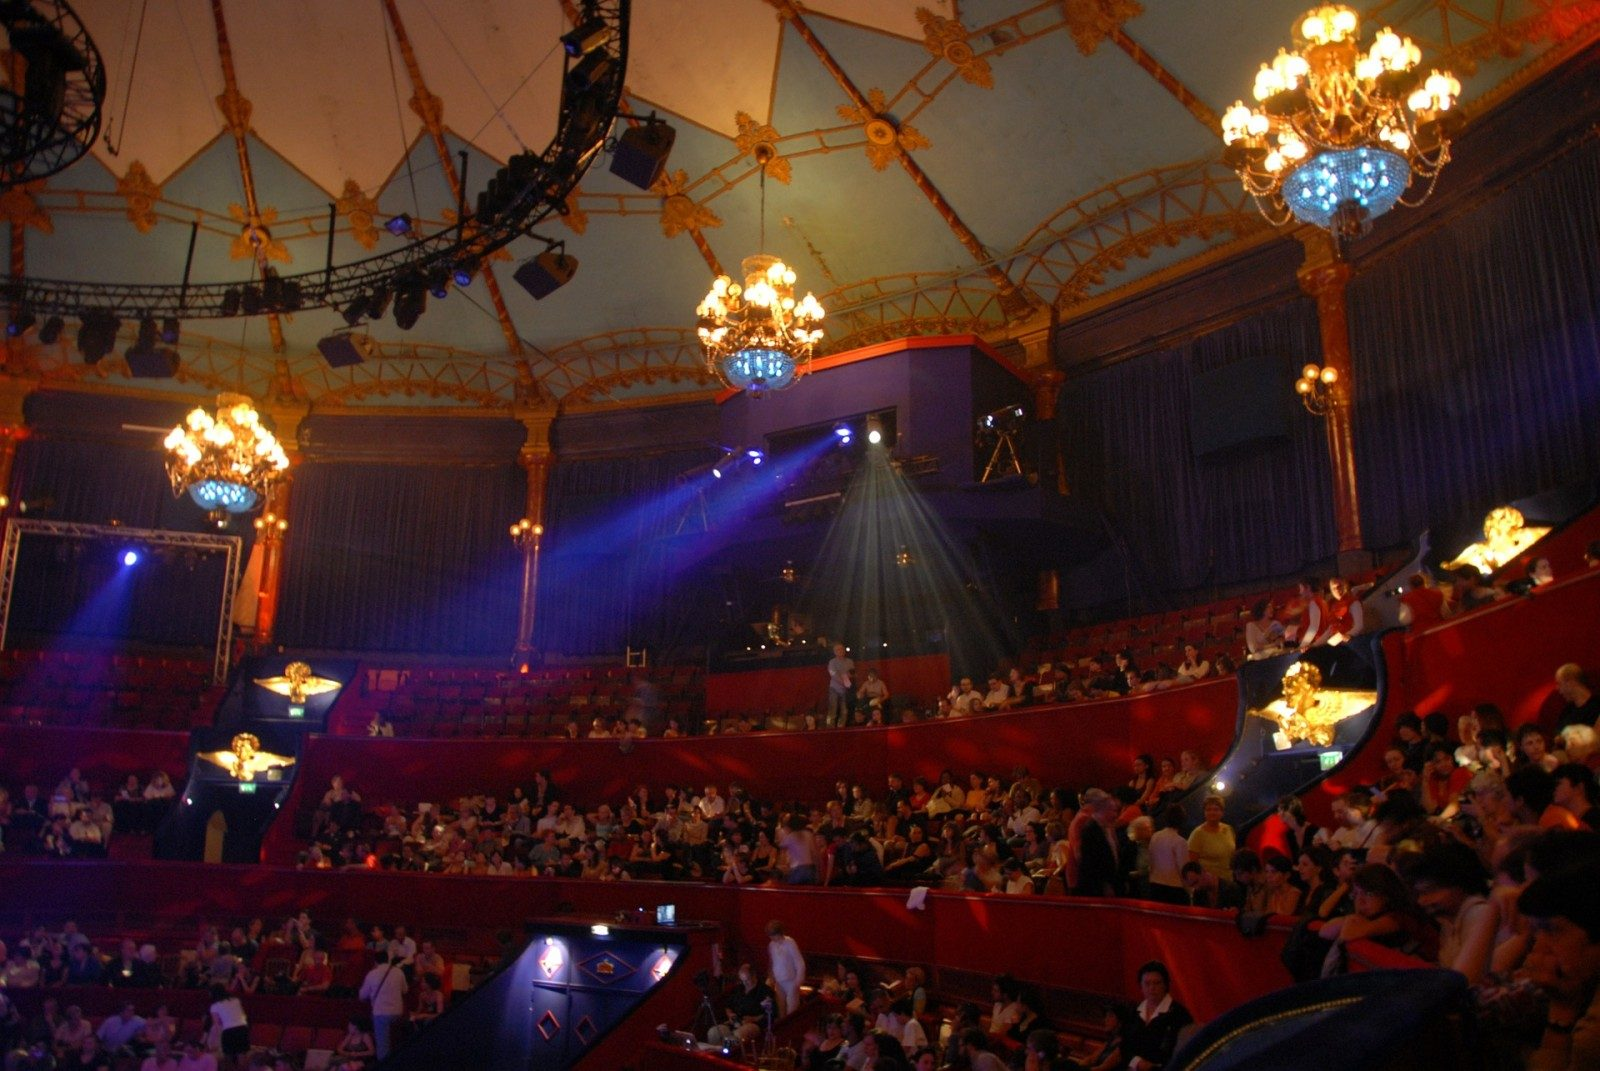 Le cirque Medrano et ses «Légendes de la Jungle» à Metz Expo